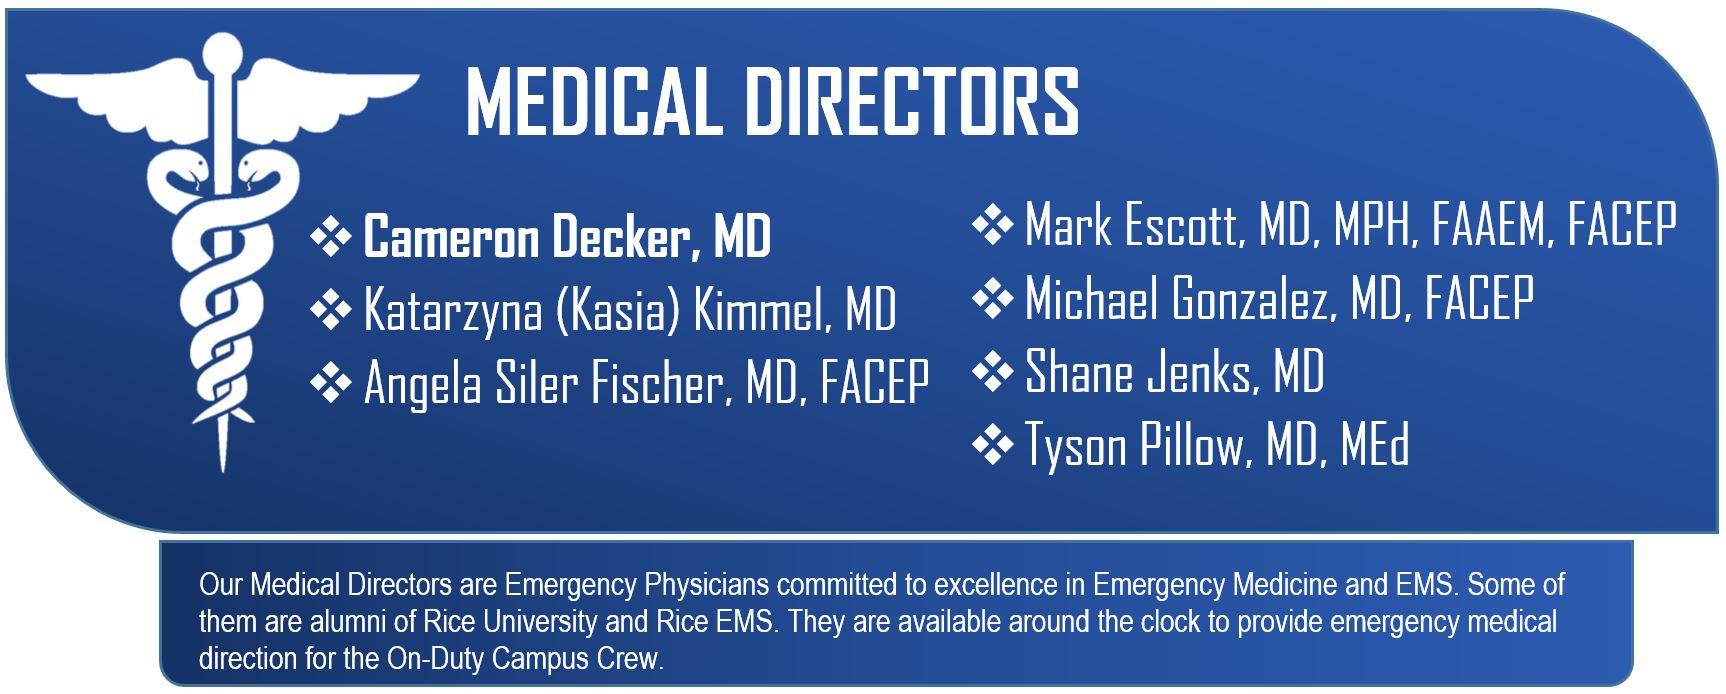 Med Directors